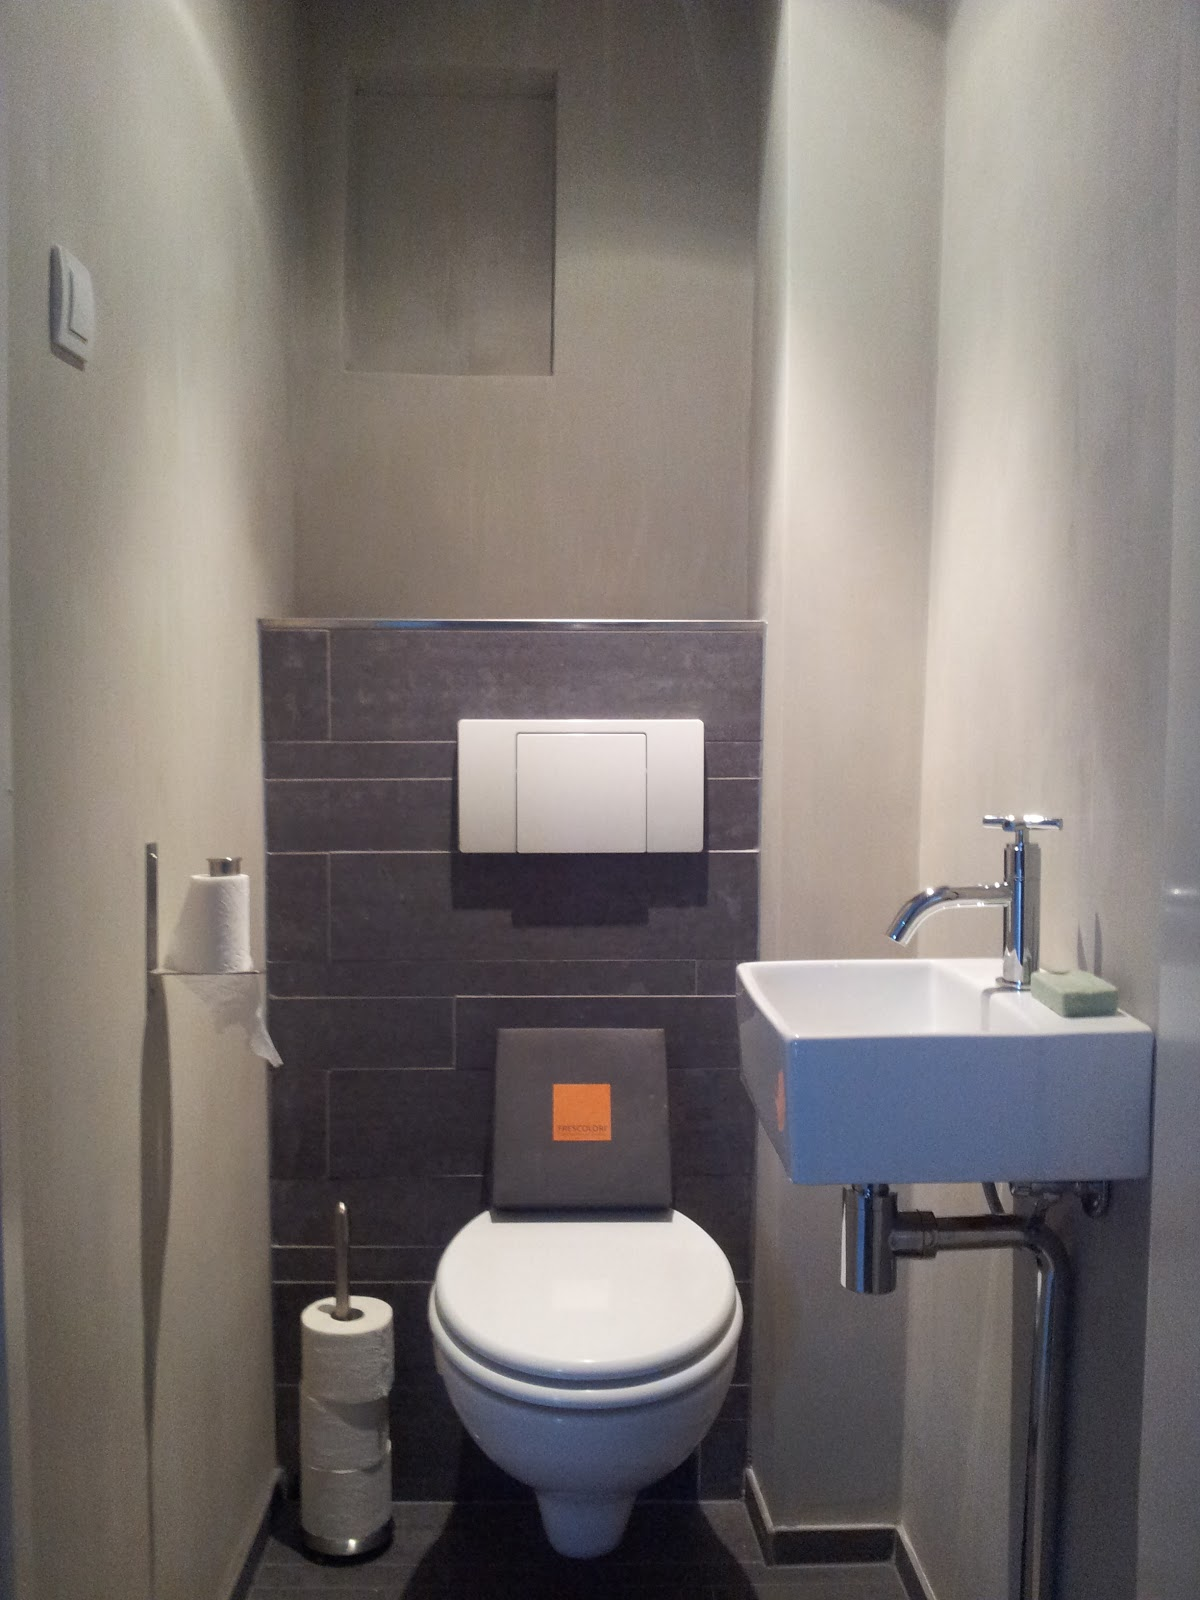 Betonlook: Frescoloriu00ae Kalkverf Toilet + Porcelano tegels